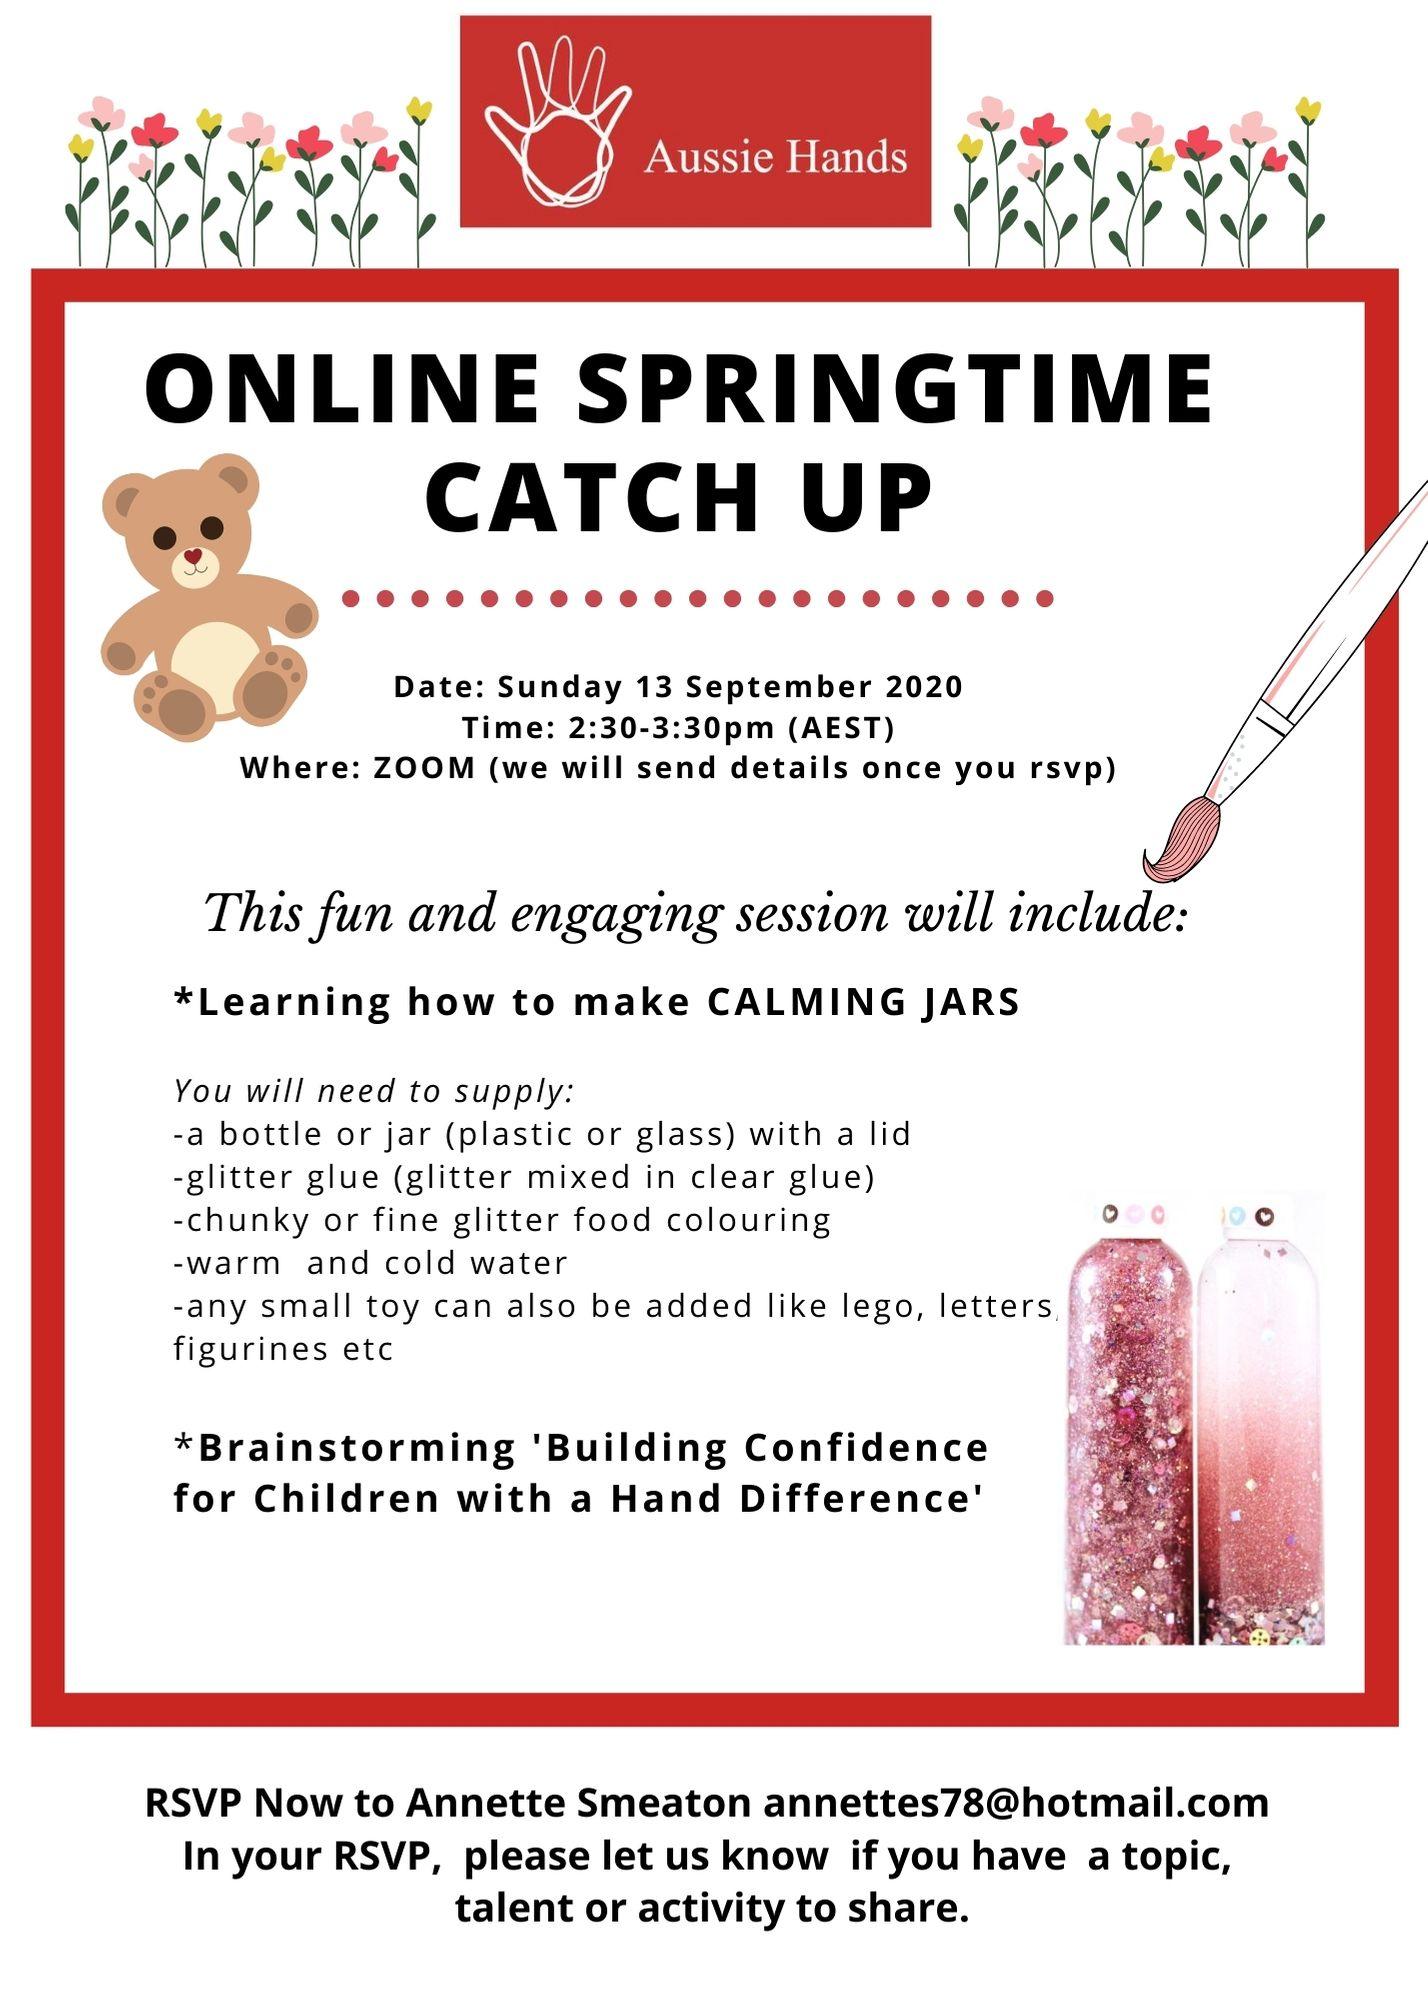 Online Springtime Catch Up